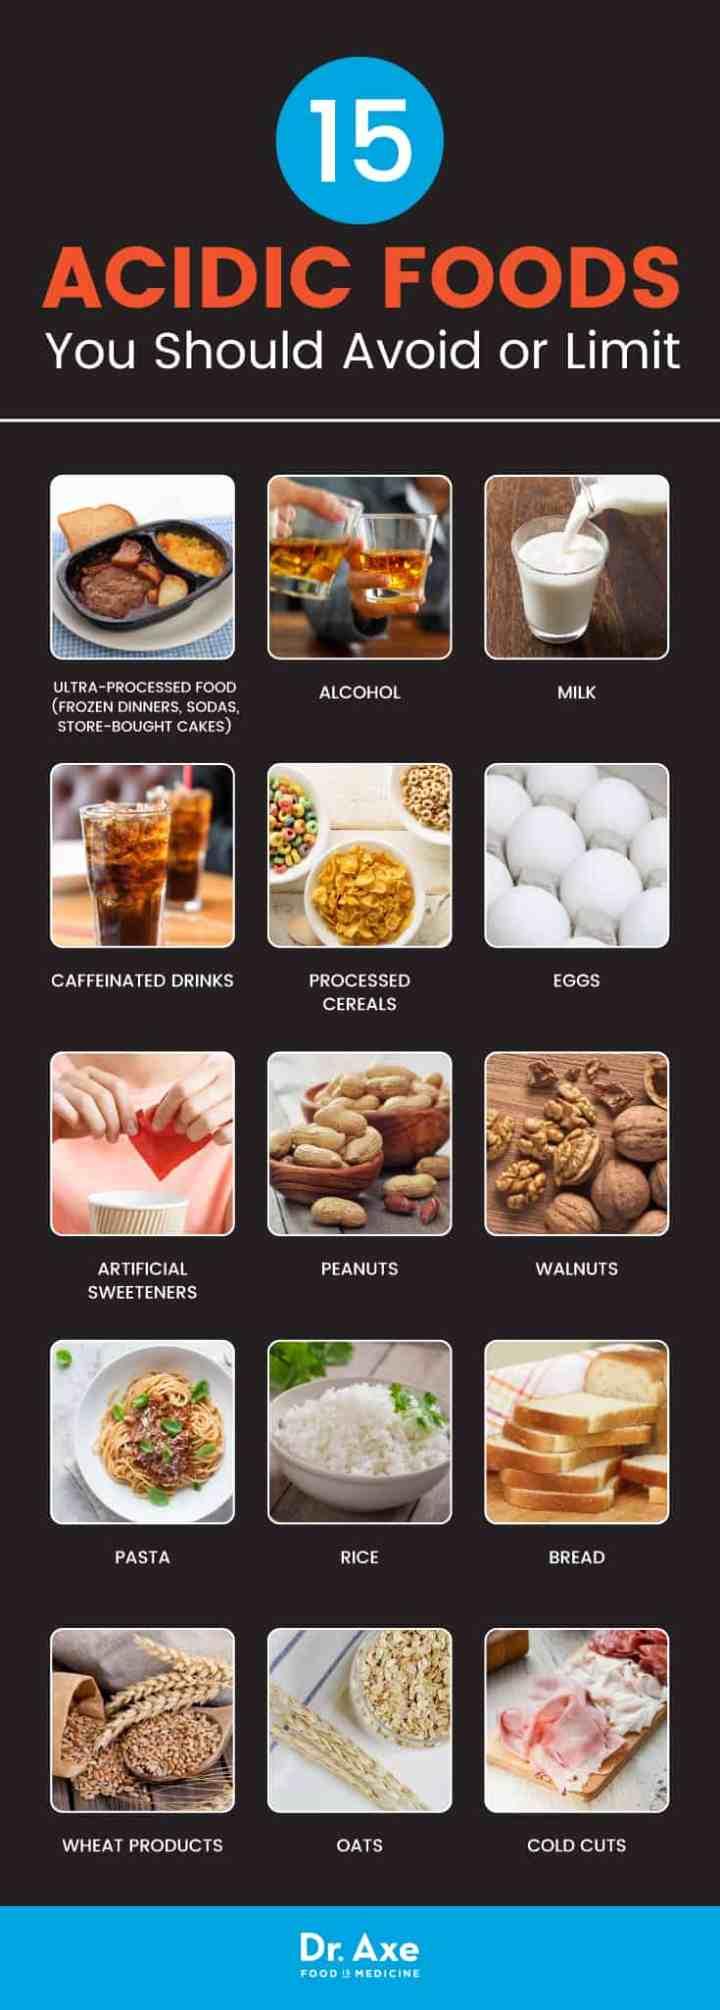 Acidic foods - Dr. Axe